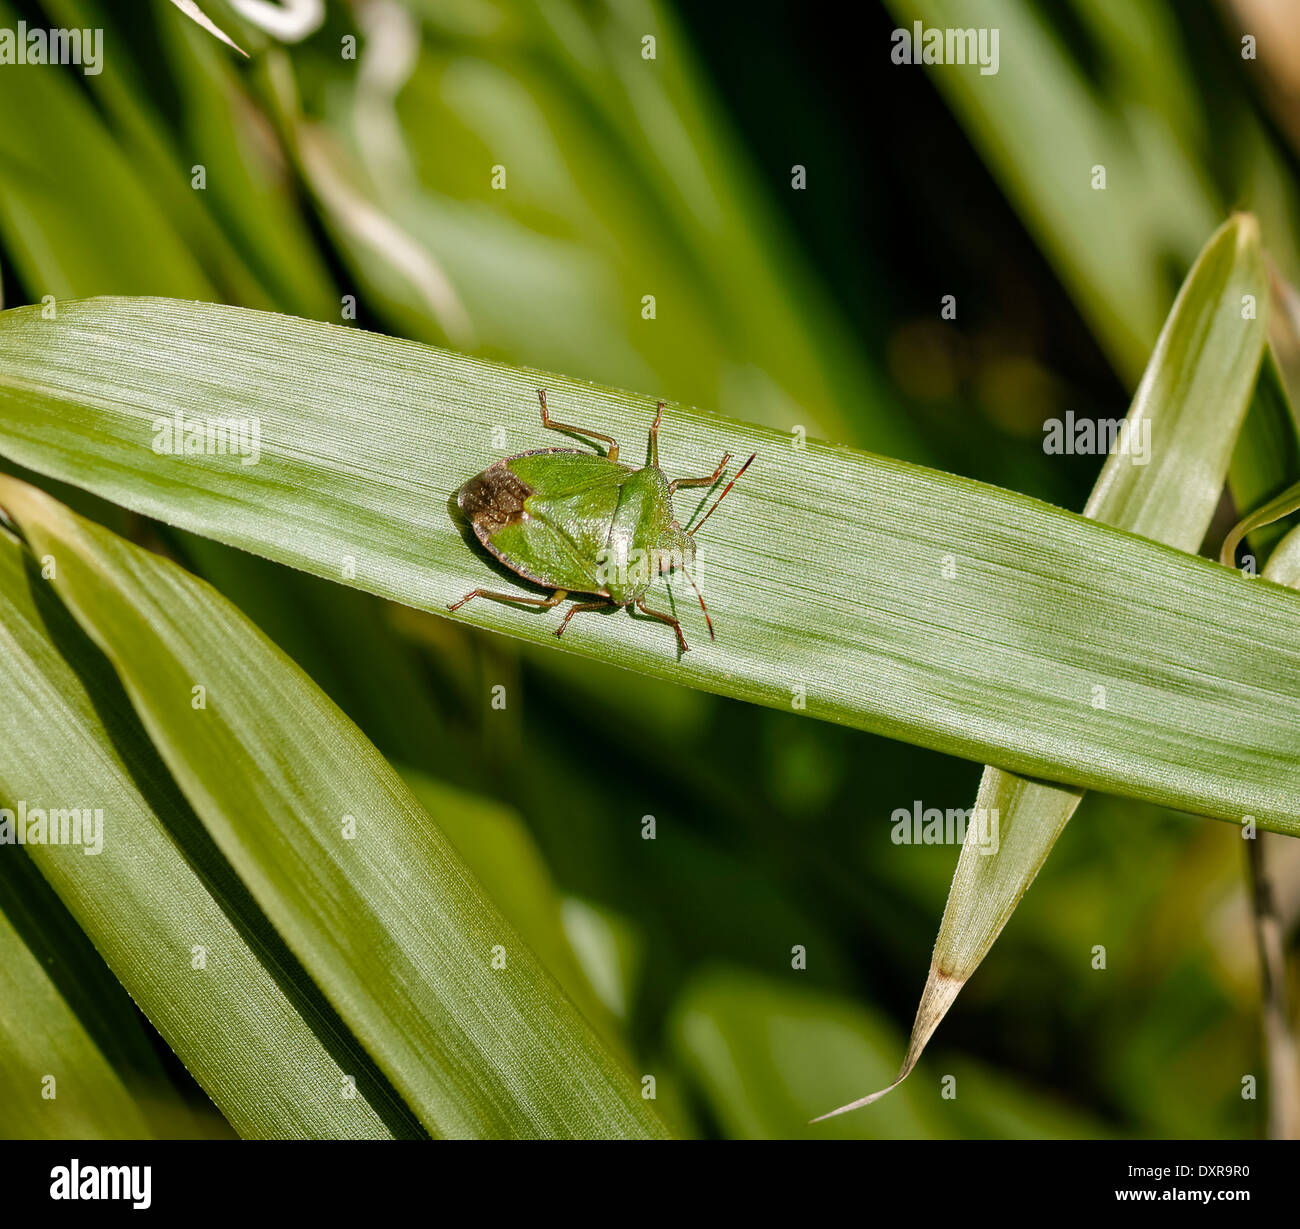 Green Shield Bug (Stink Bug) auf Bambusblatt, wies rechts; Querformat. Stockbild